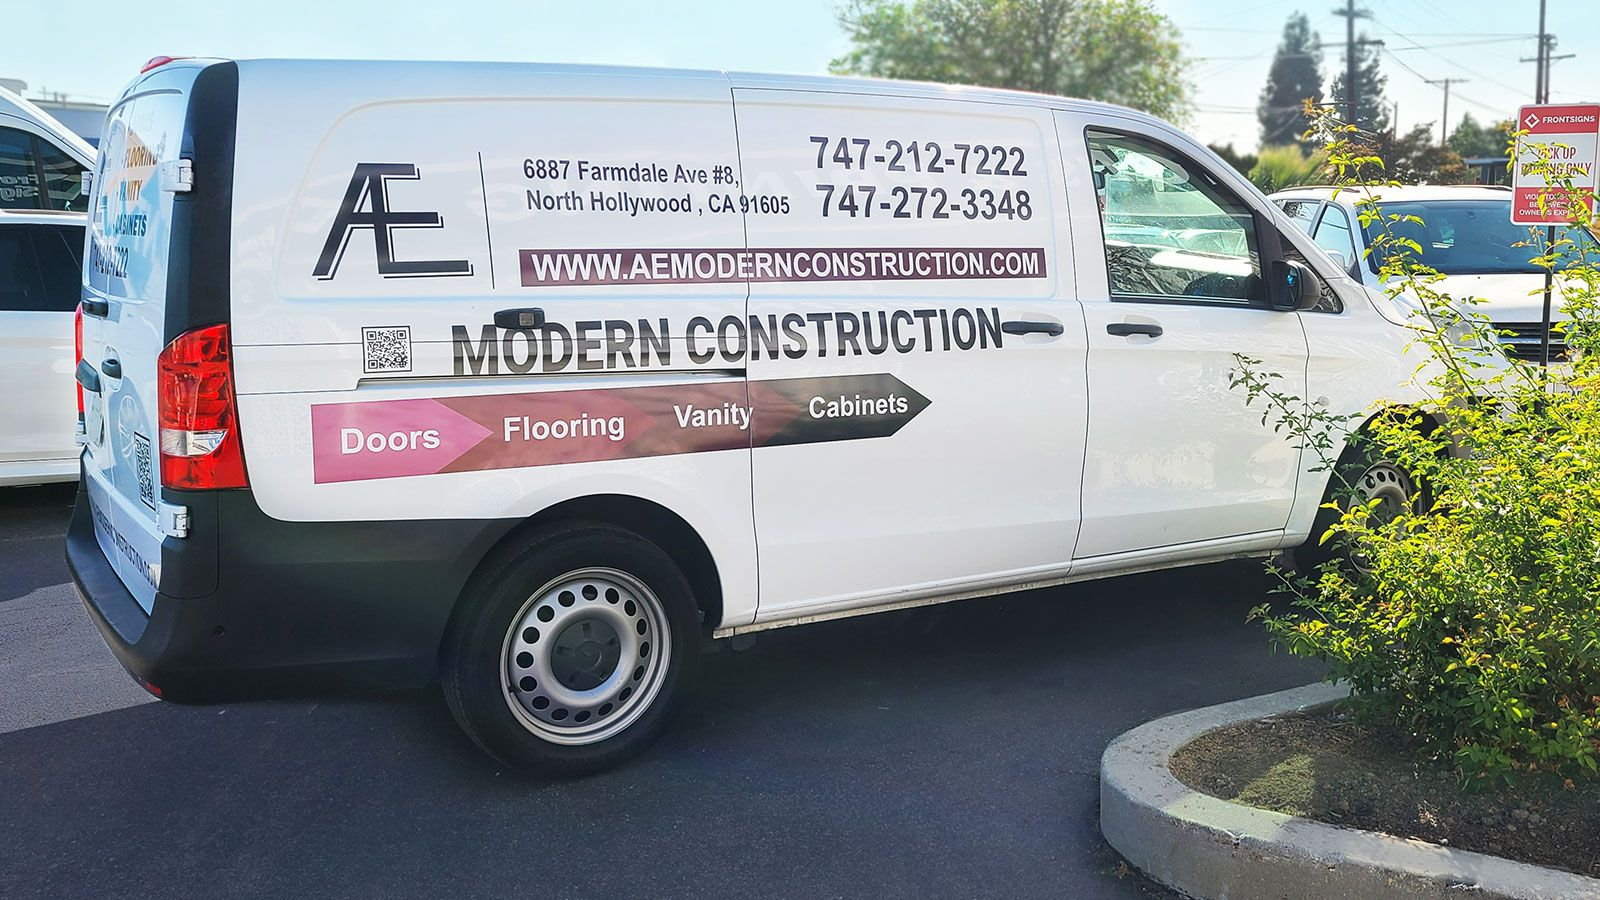 Modern Construction vehicle wrap